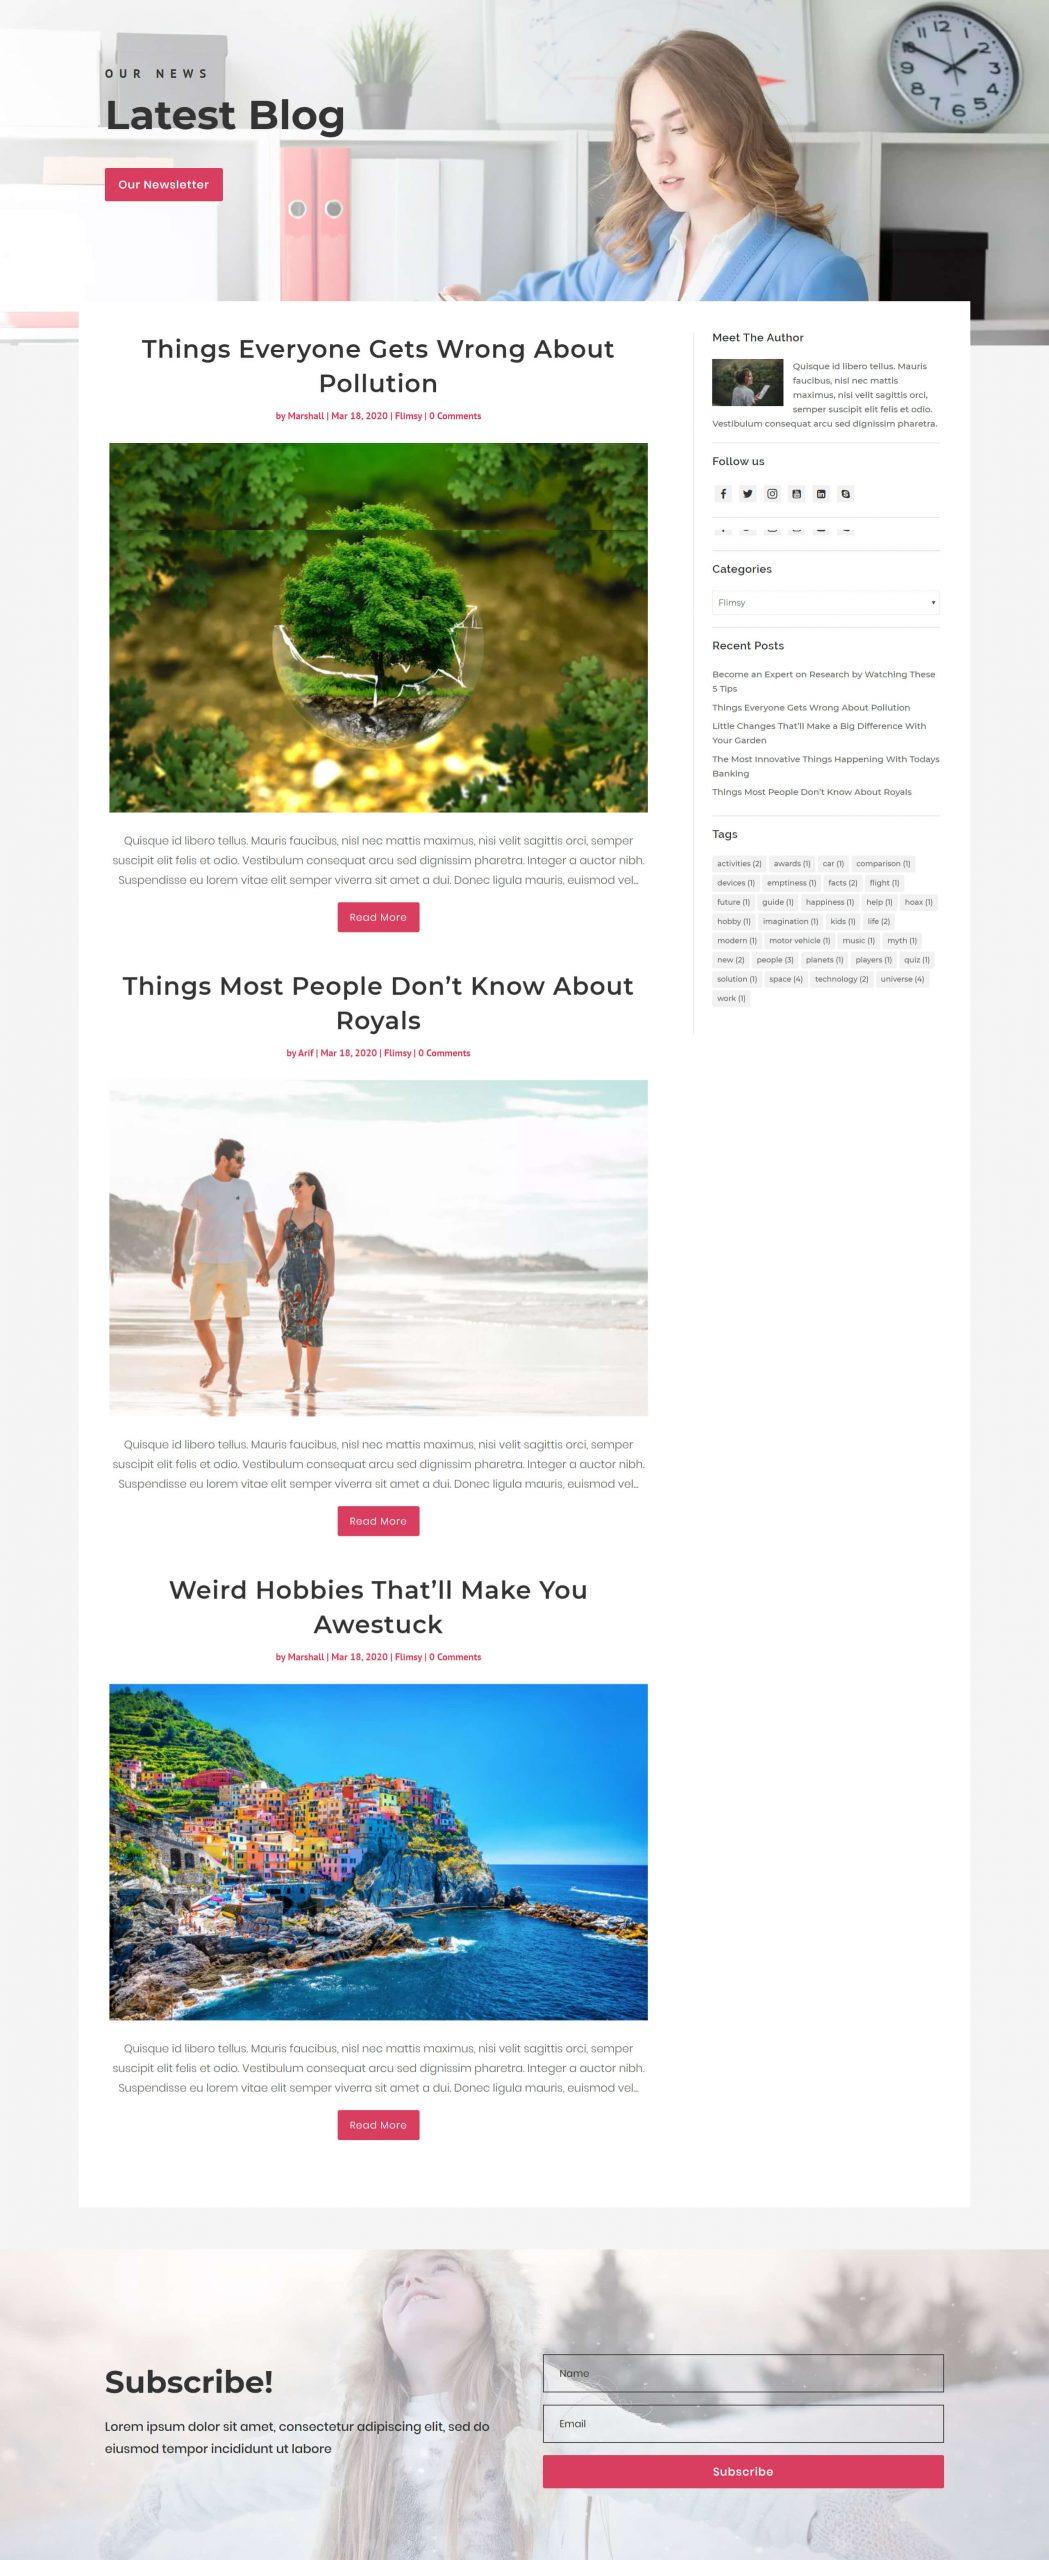 Flimsy blog layout